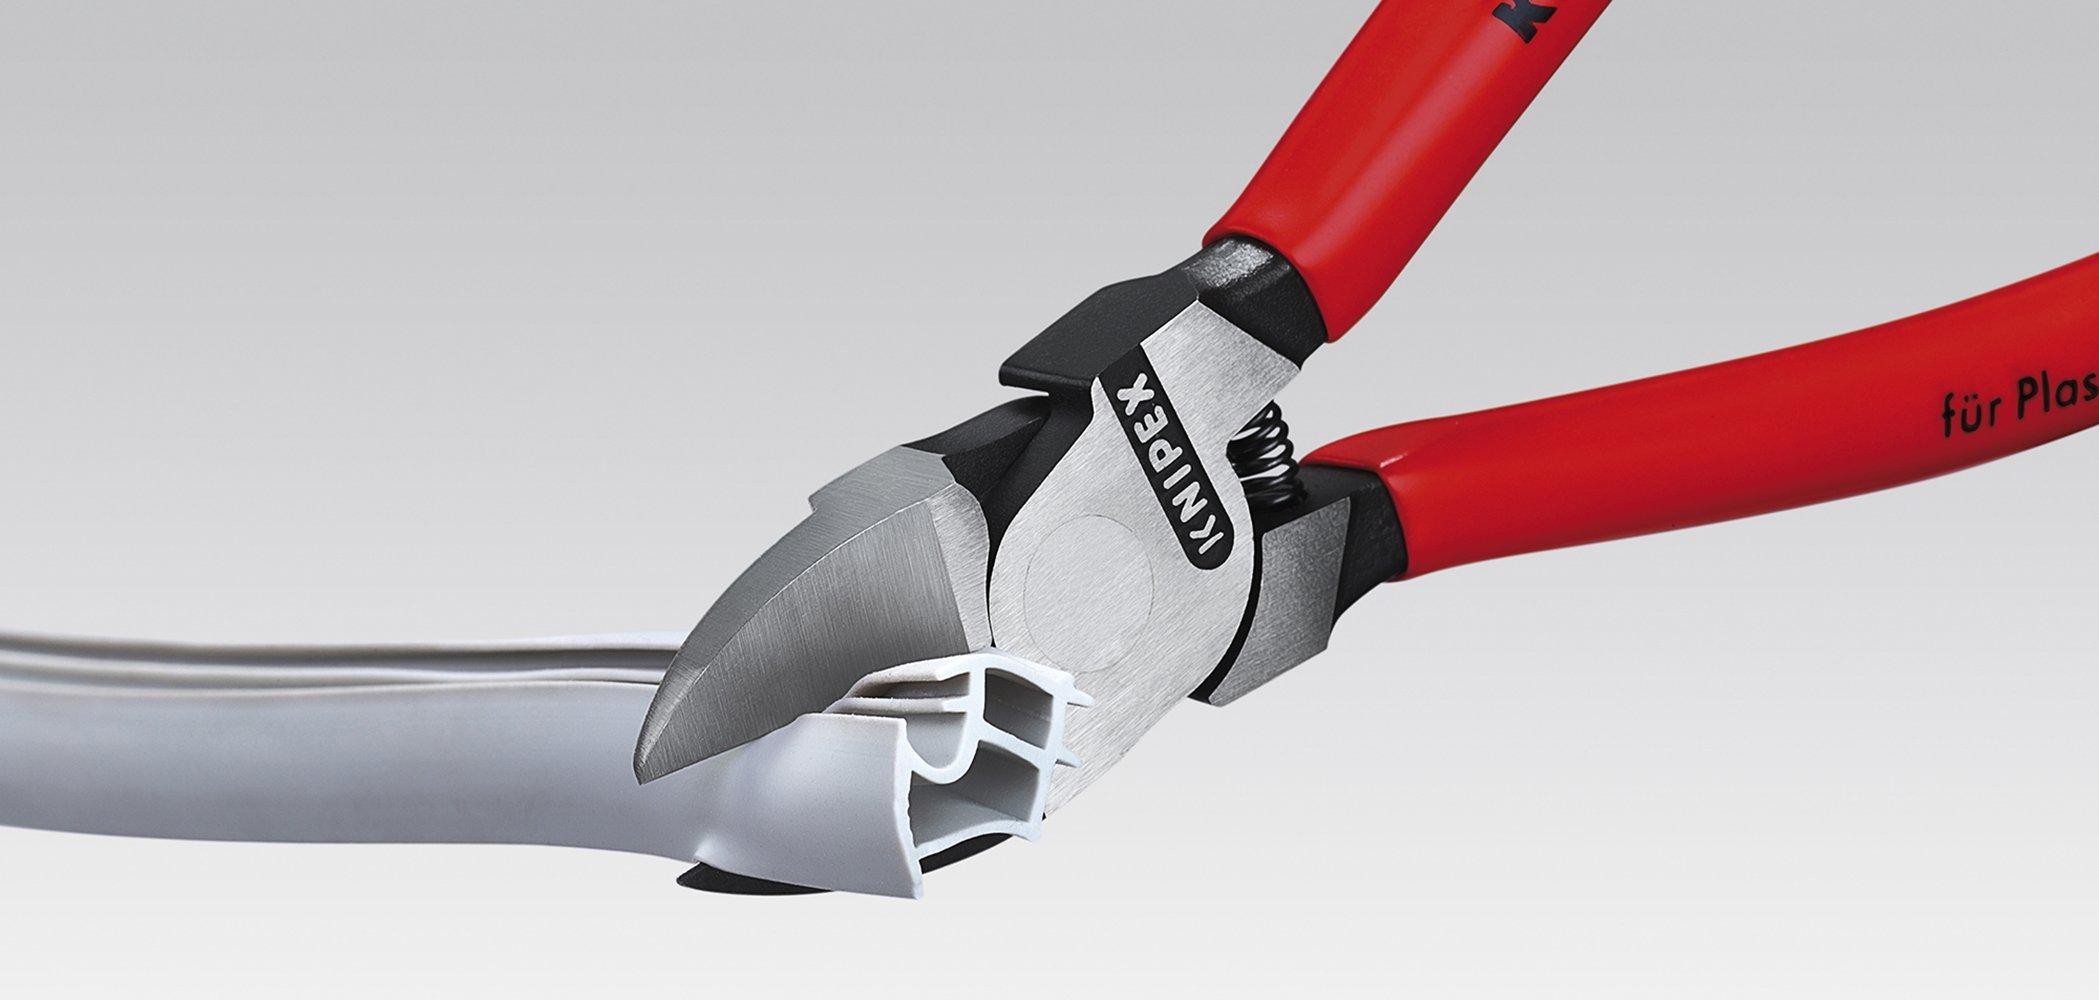 KNIPEX 72 01 160 Diagonal Flush Cutters